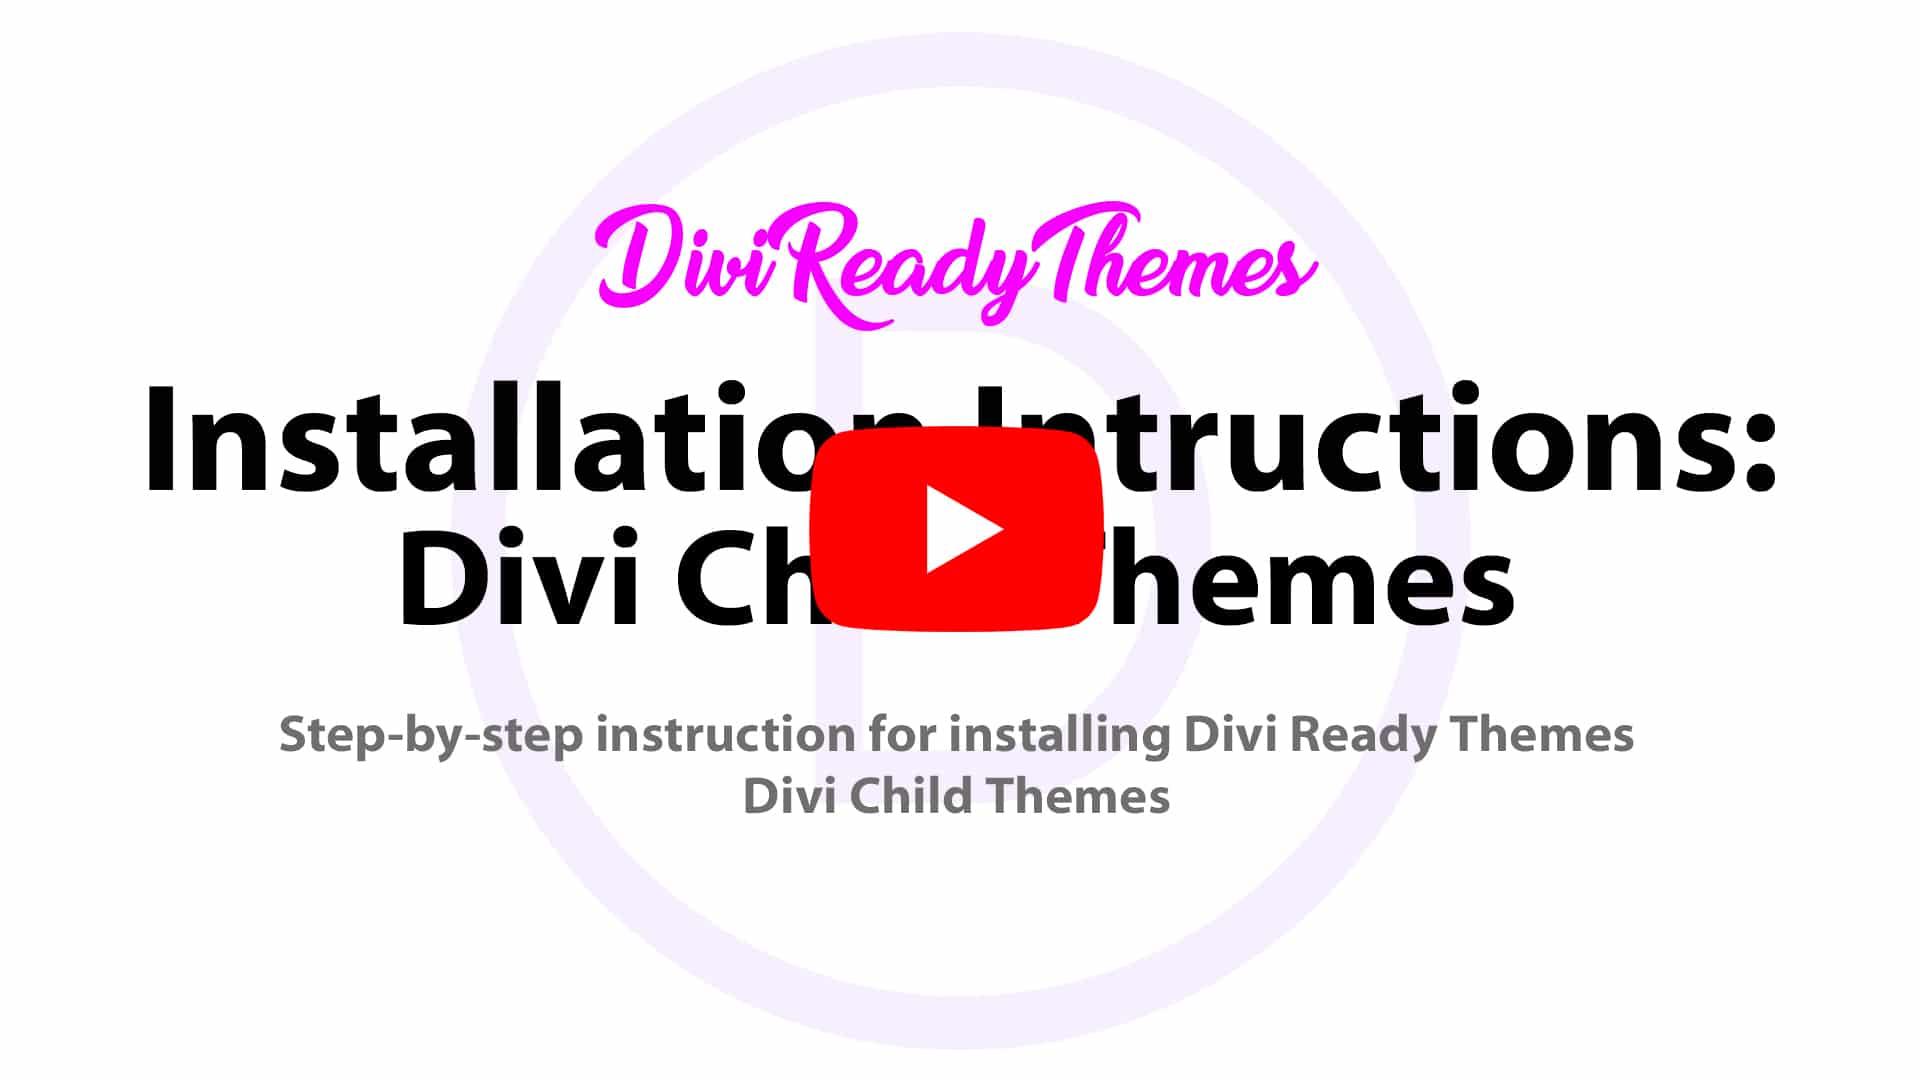 Installing a Divi Ready Theme's Divi Child Theme